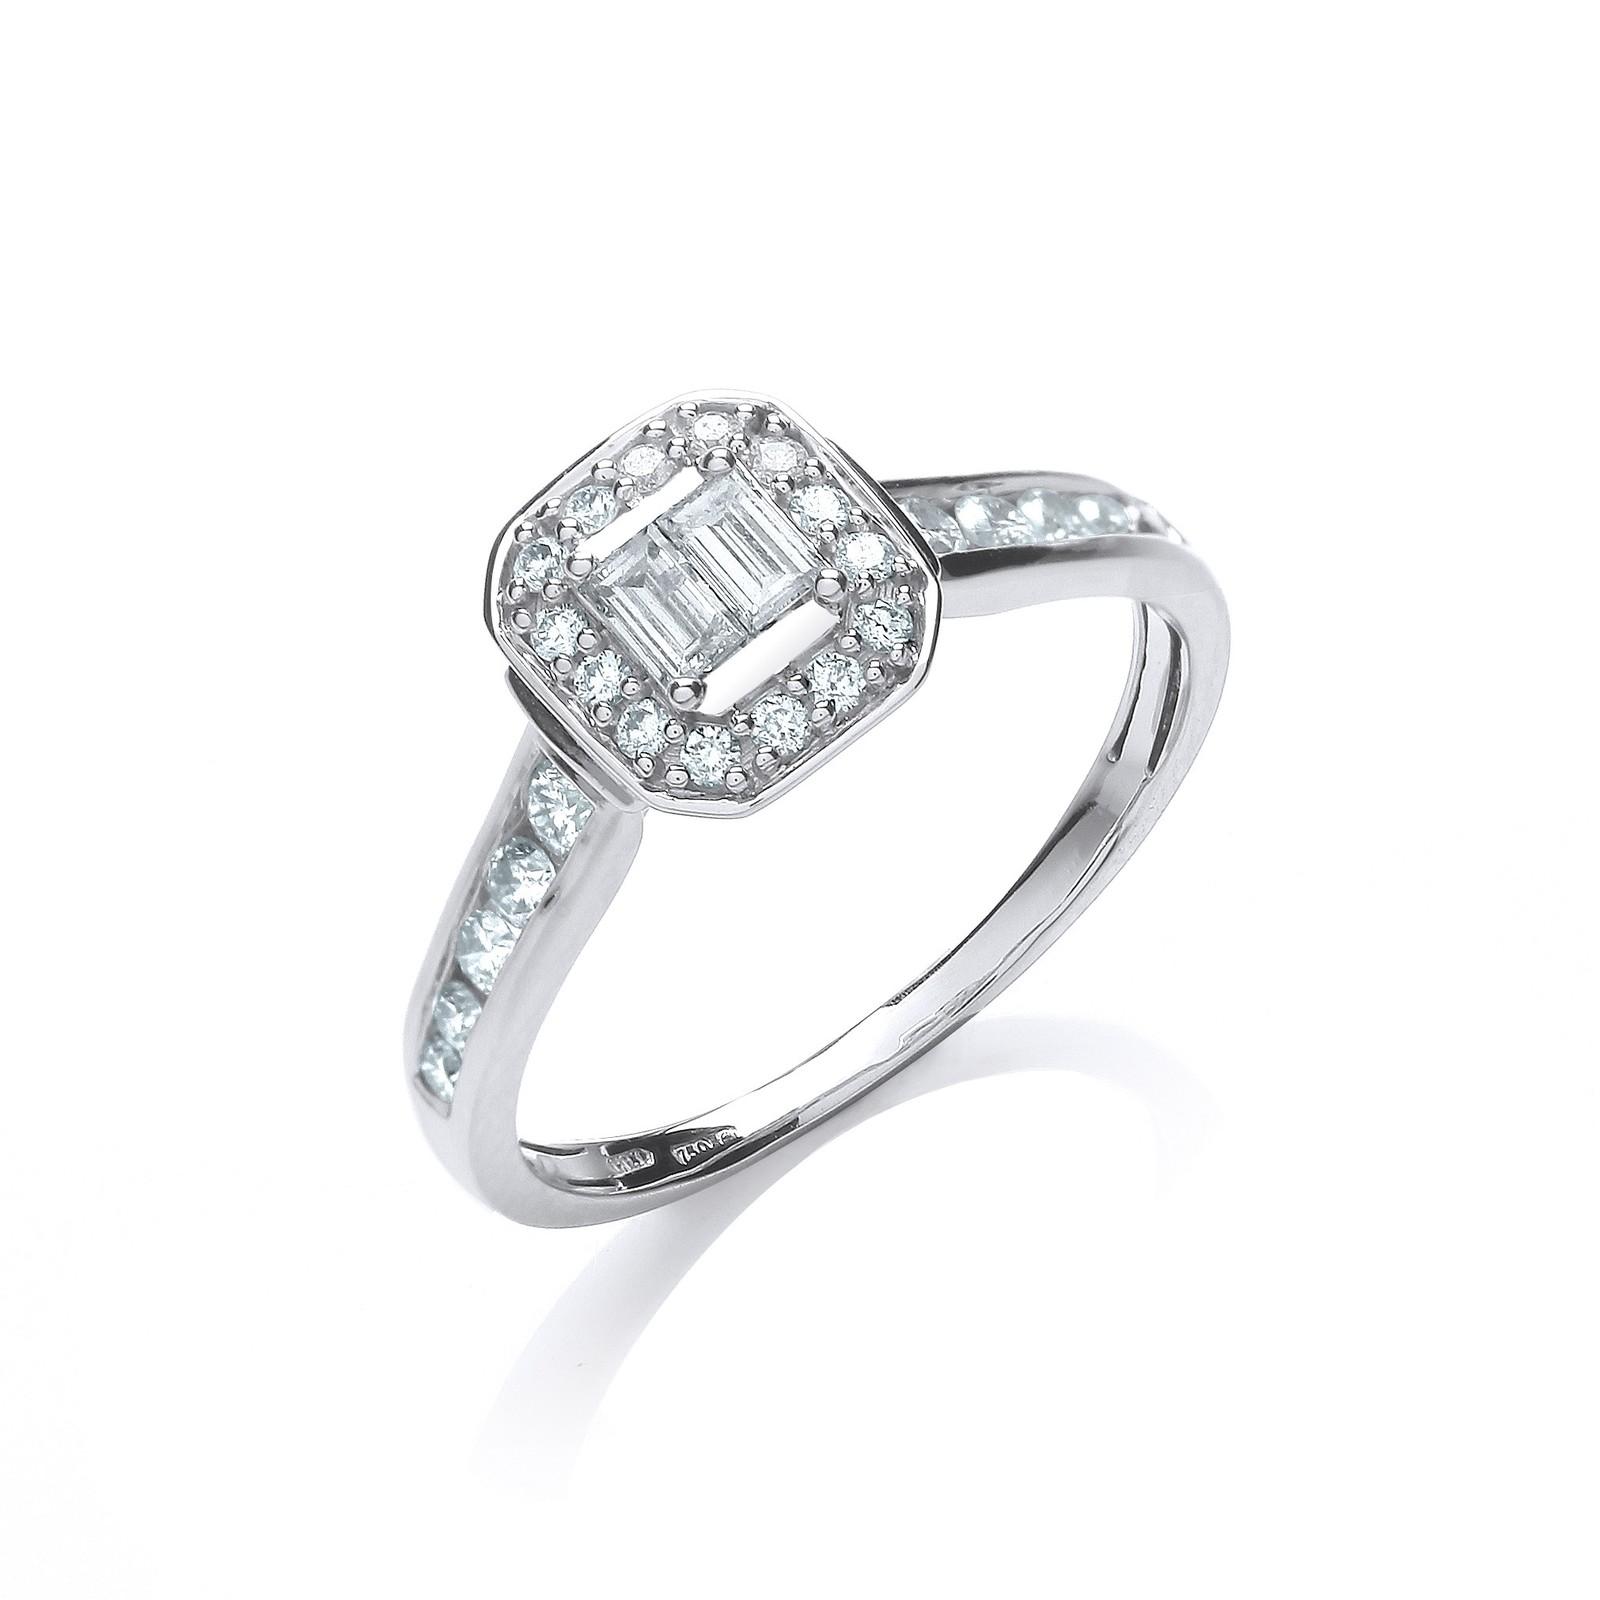 18ct White Gold 0.55ct Diamond Dress Ring